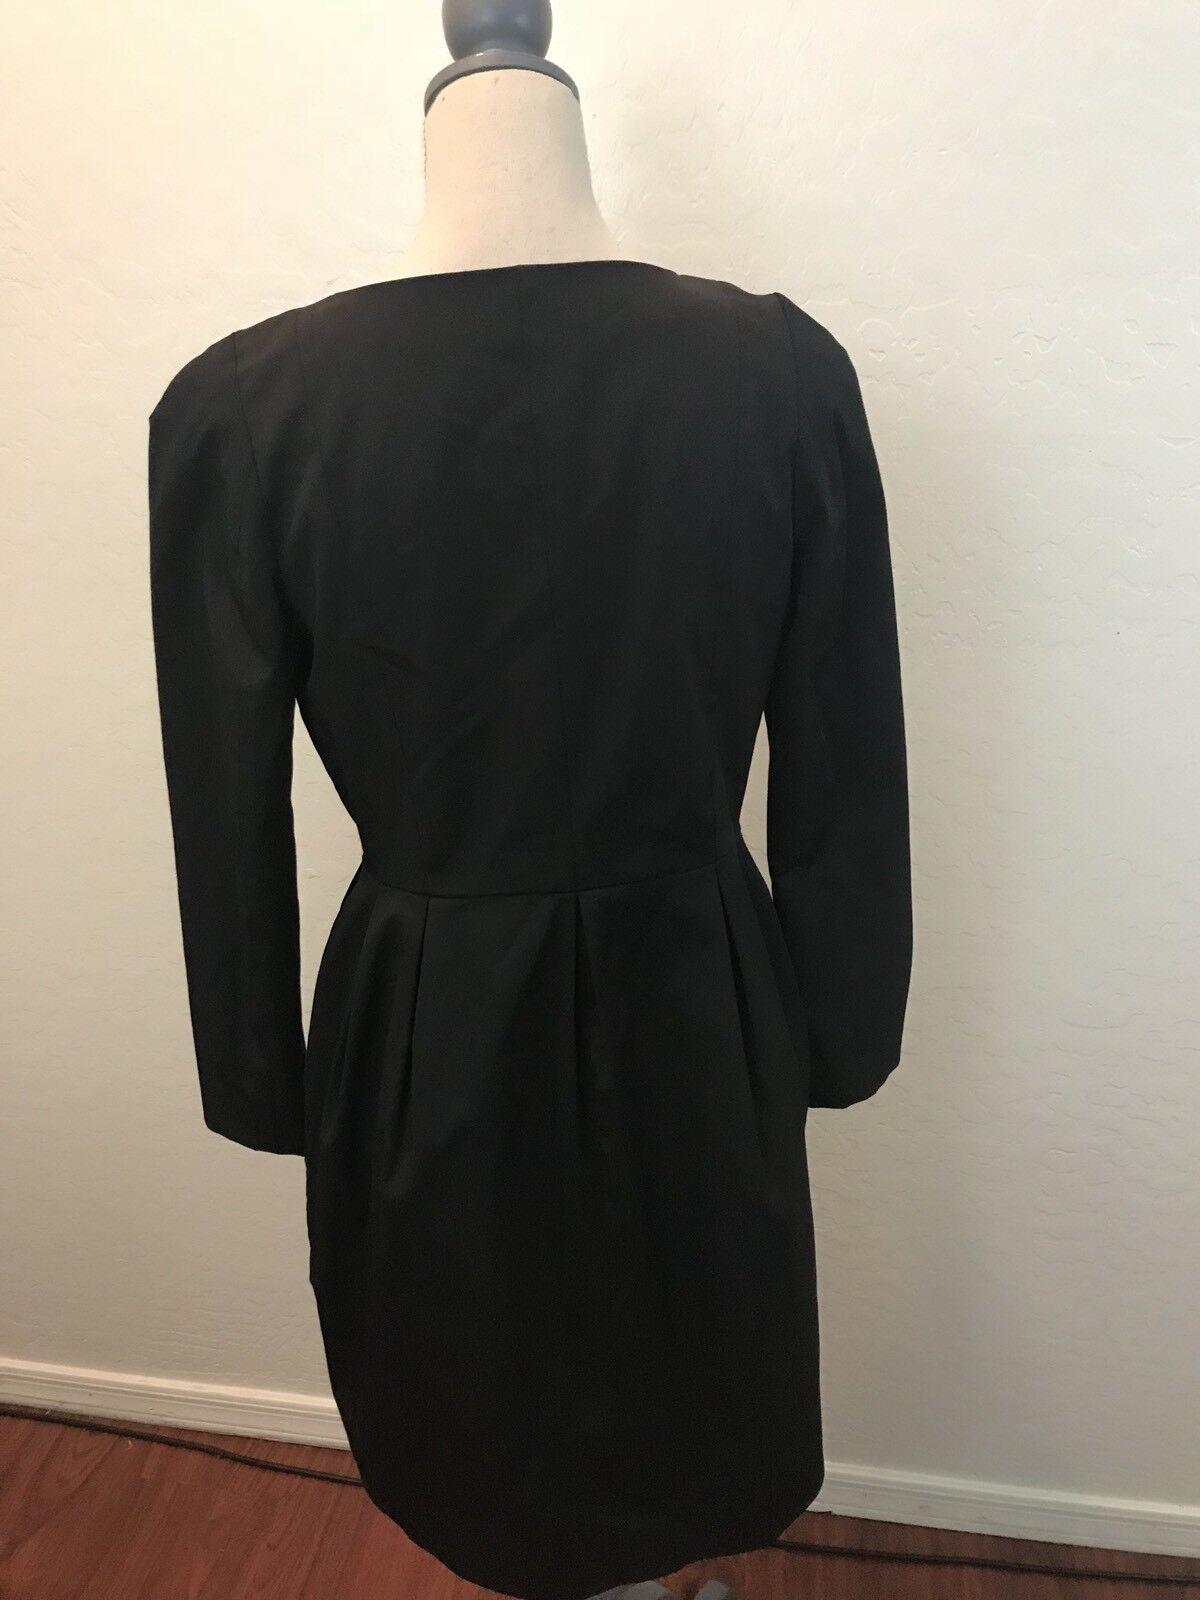 H&M H&M H&M Women's Pea Coat Style Dress Size 8 40668e